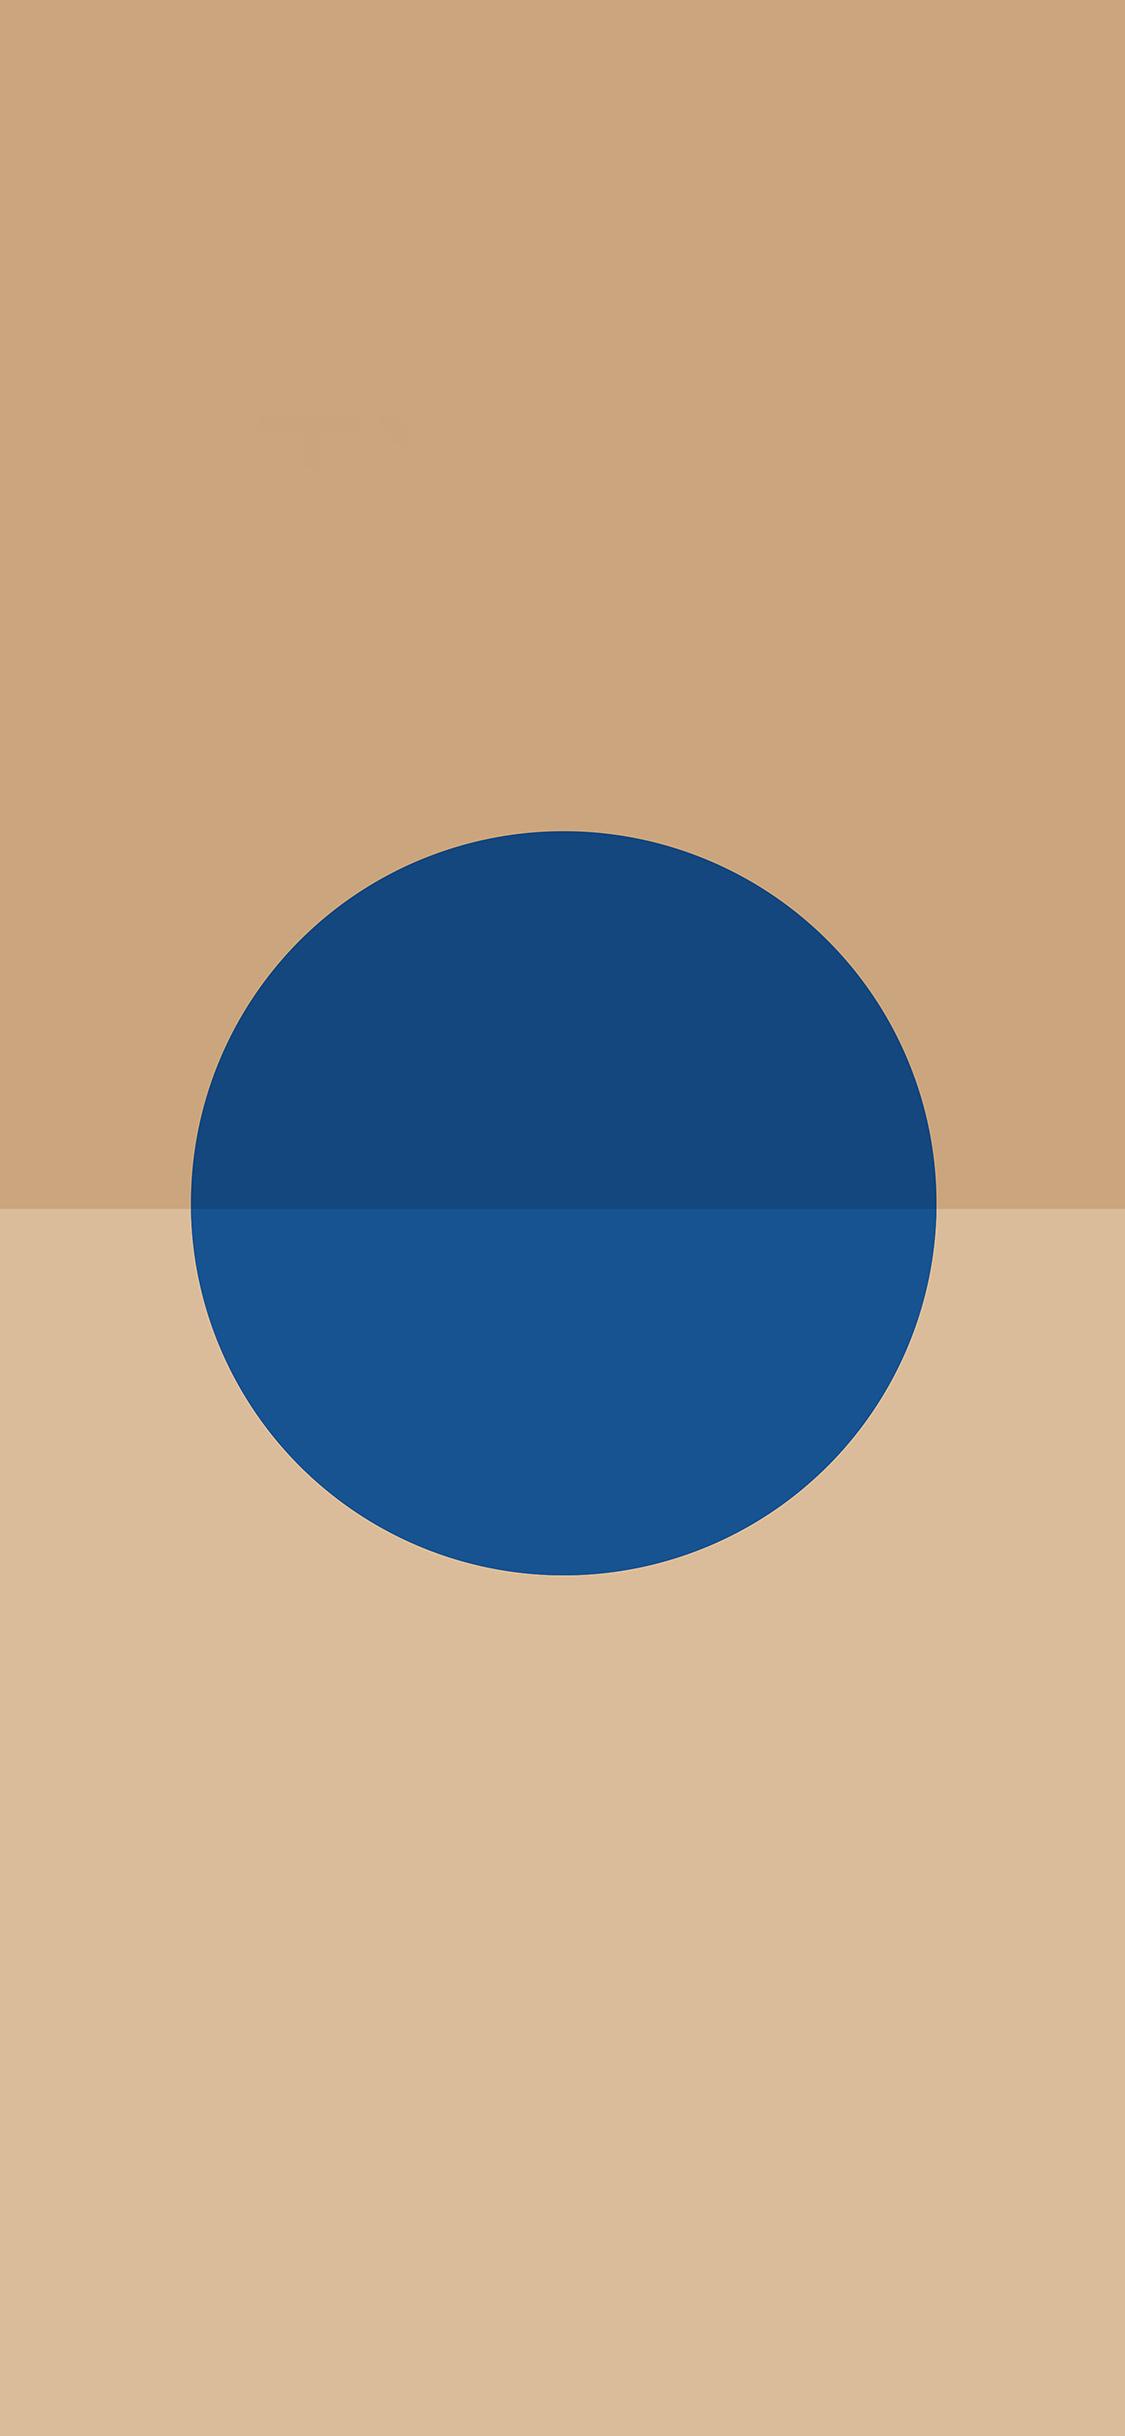 iPhoneXpapers.com-Apple-iPhone-wallpaper-ar39-minimal-tycho-art-blue-sun-yellow-illustration